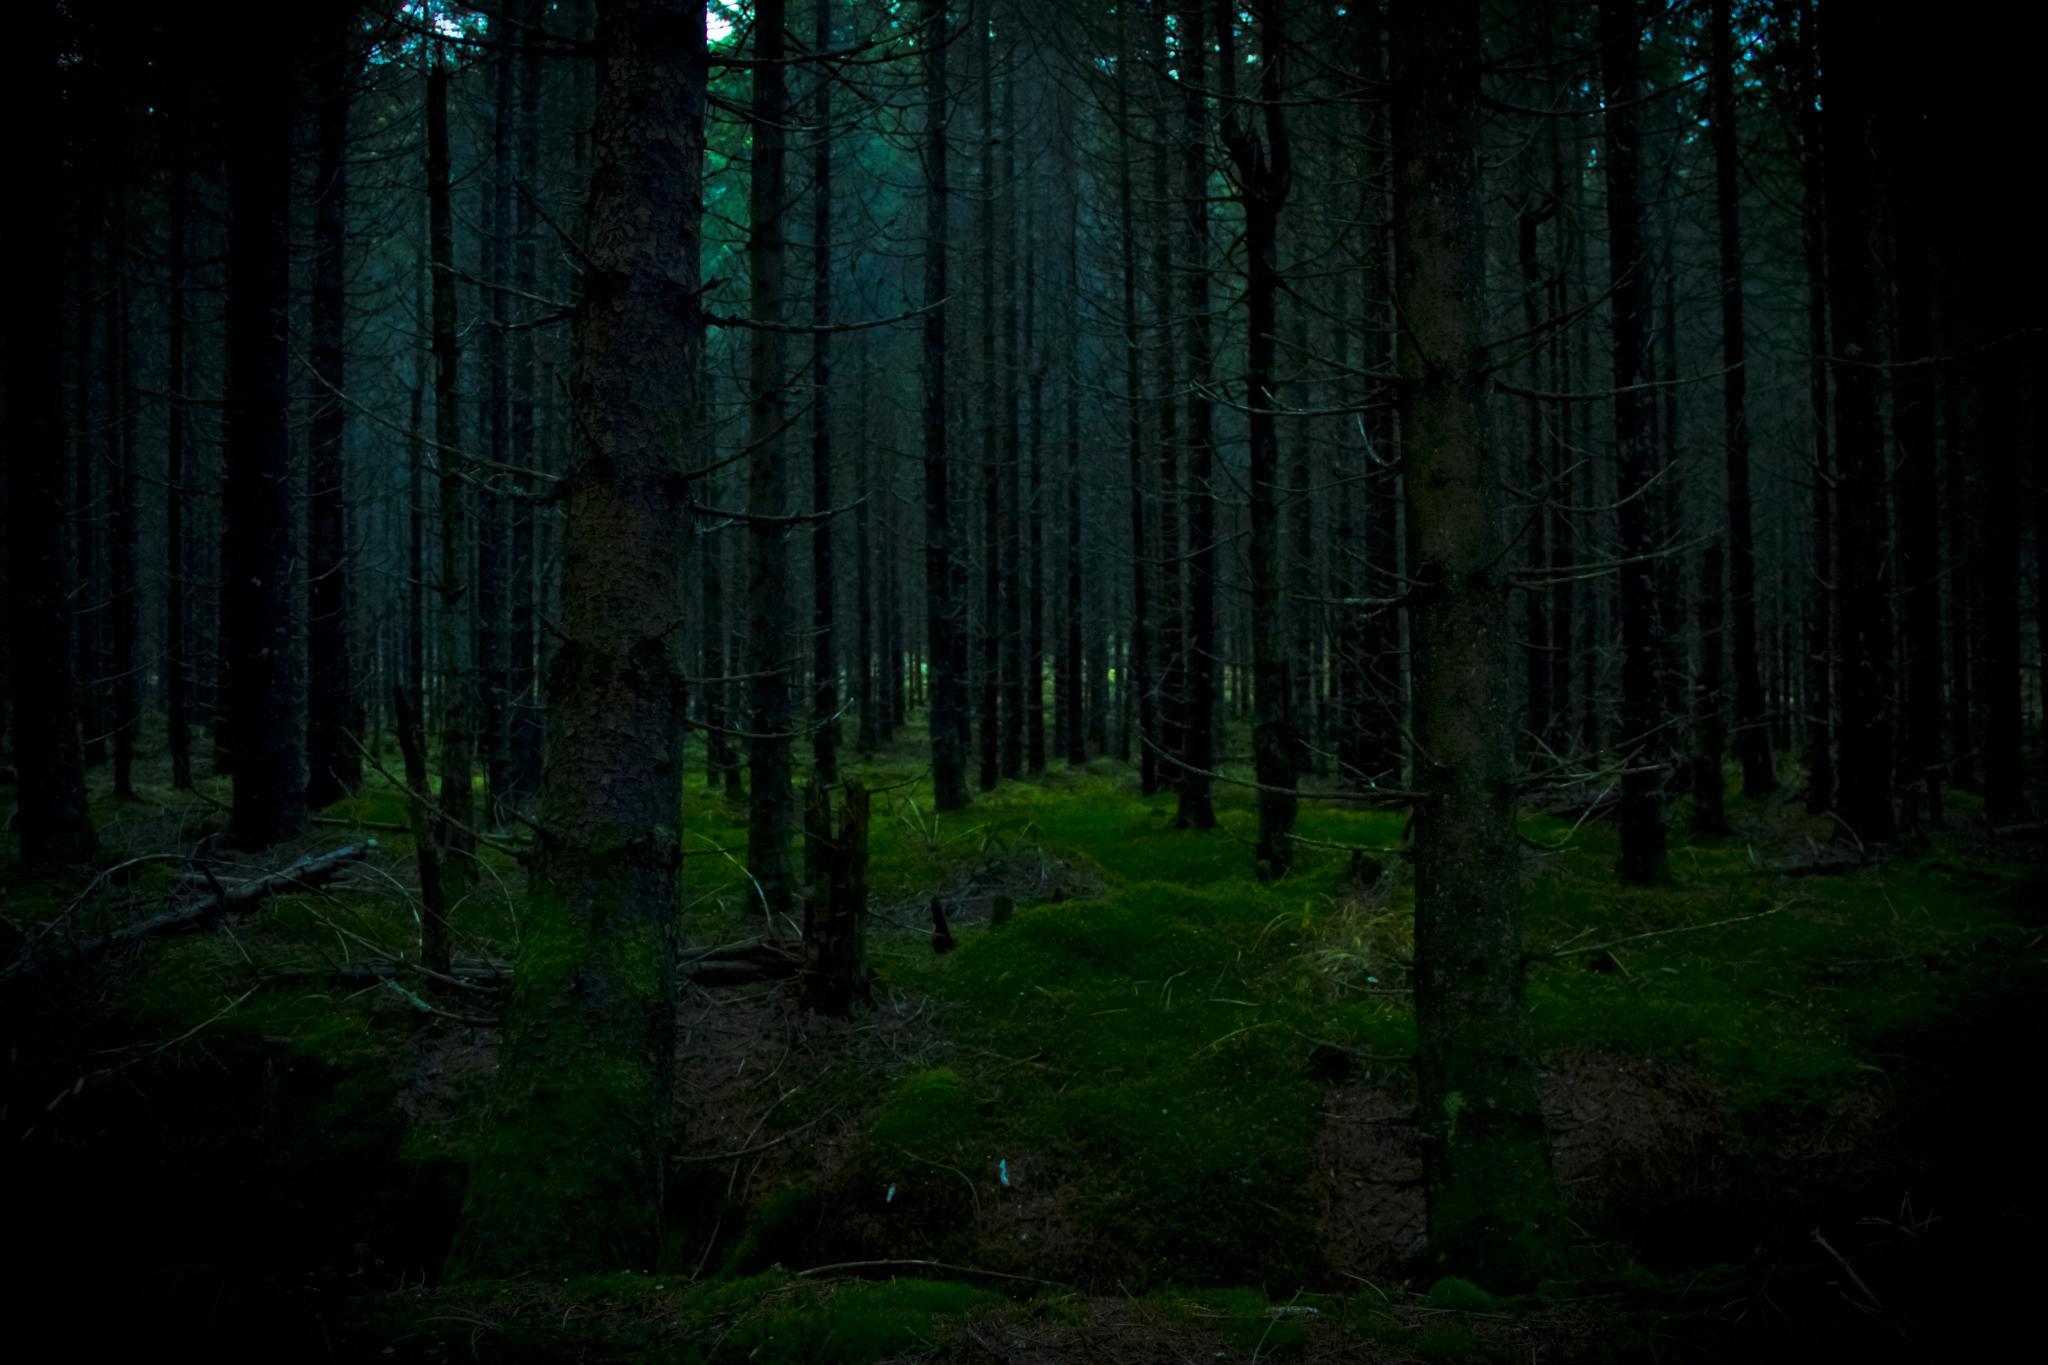 Forest by maikelaarmot